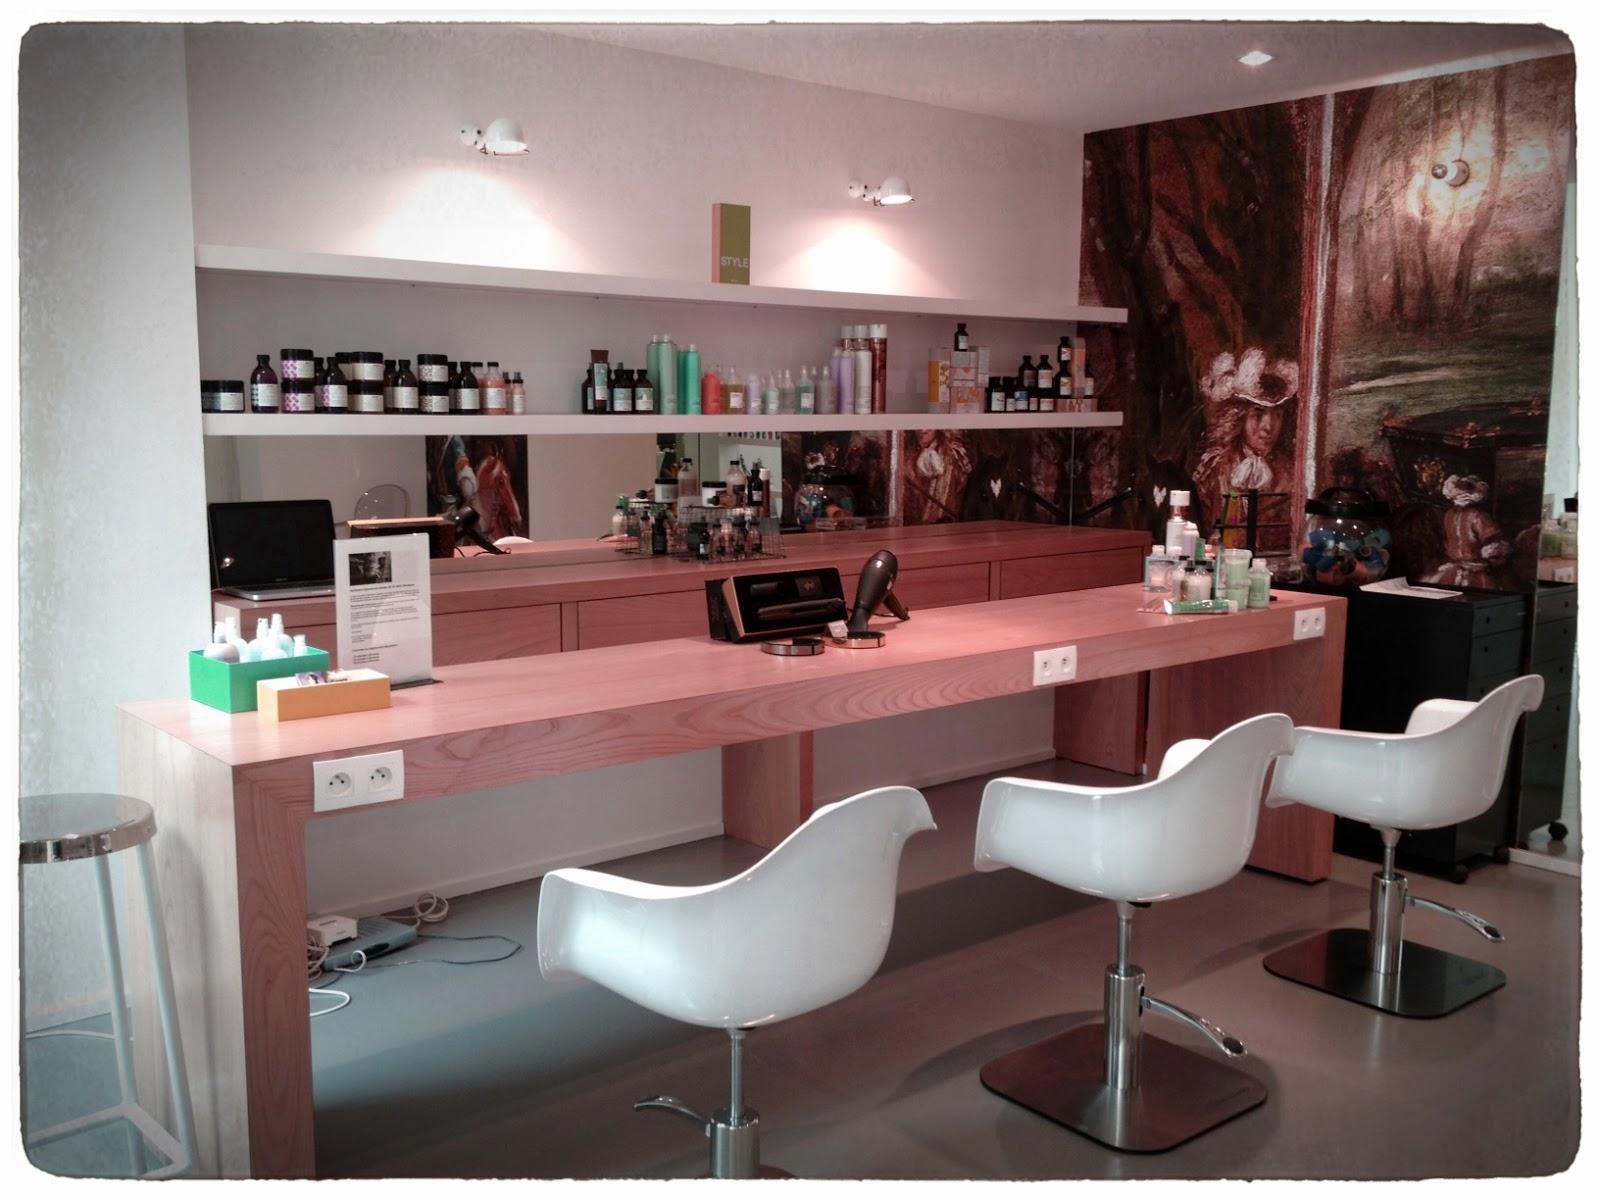 La bordesienne juin 2013 for Ongles salon